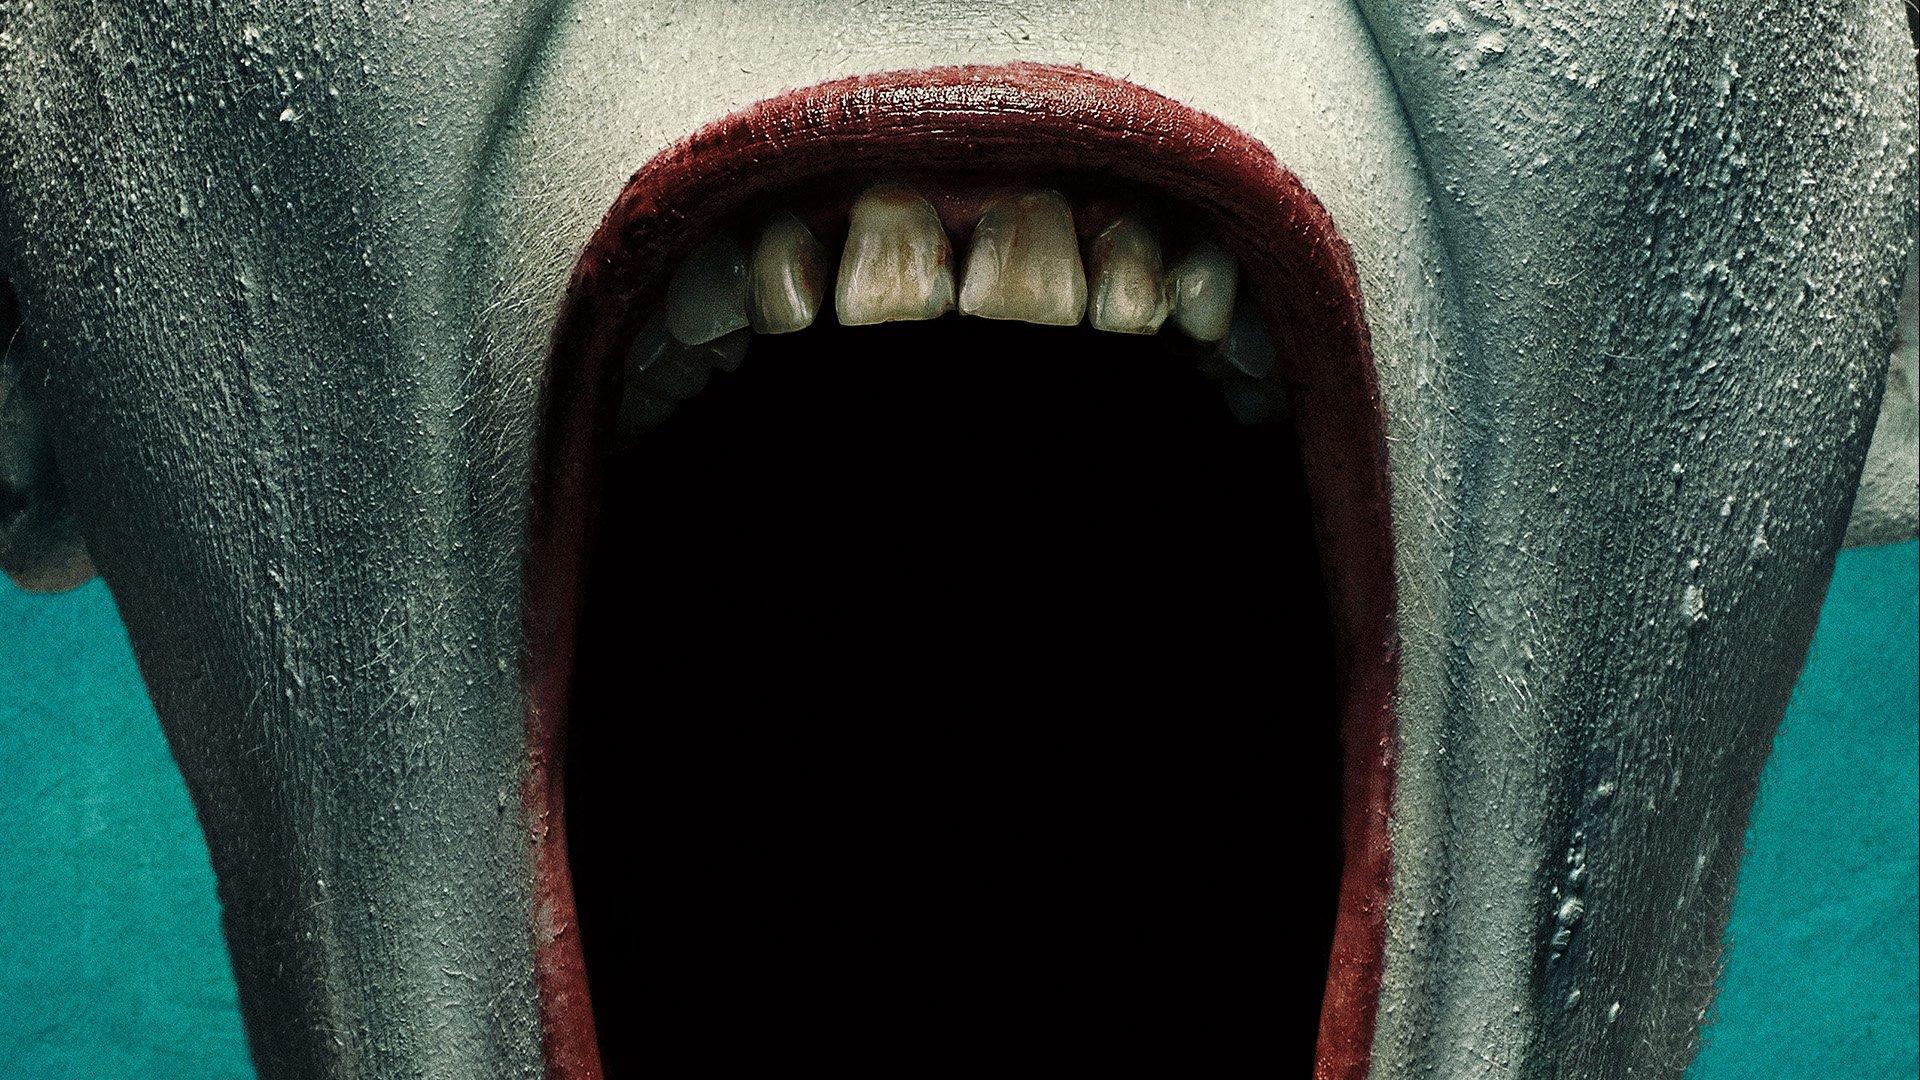 American horror story freak show hd wallpaper - Ahs wallpaper ...